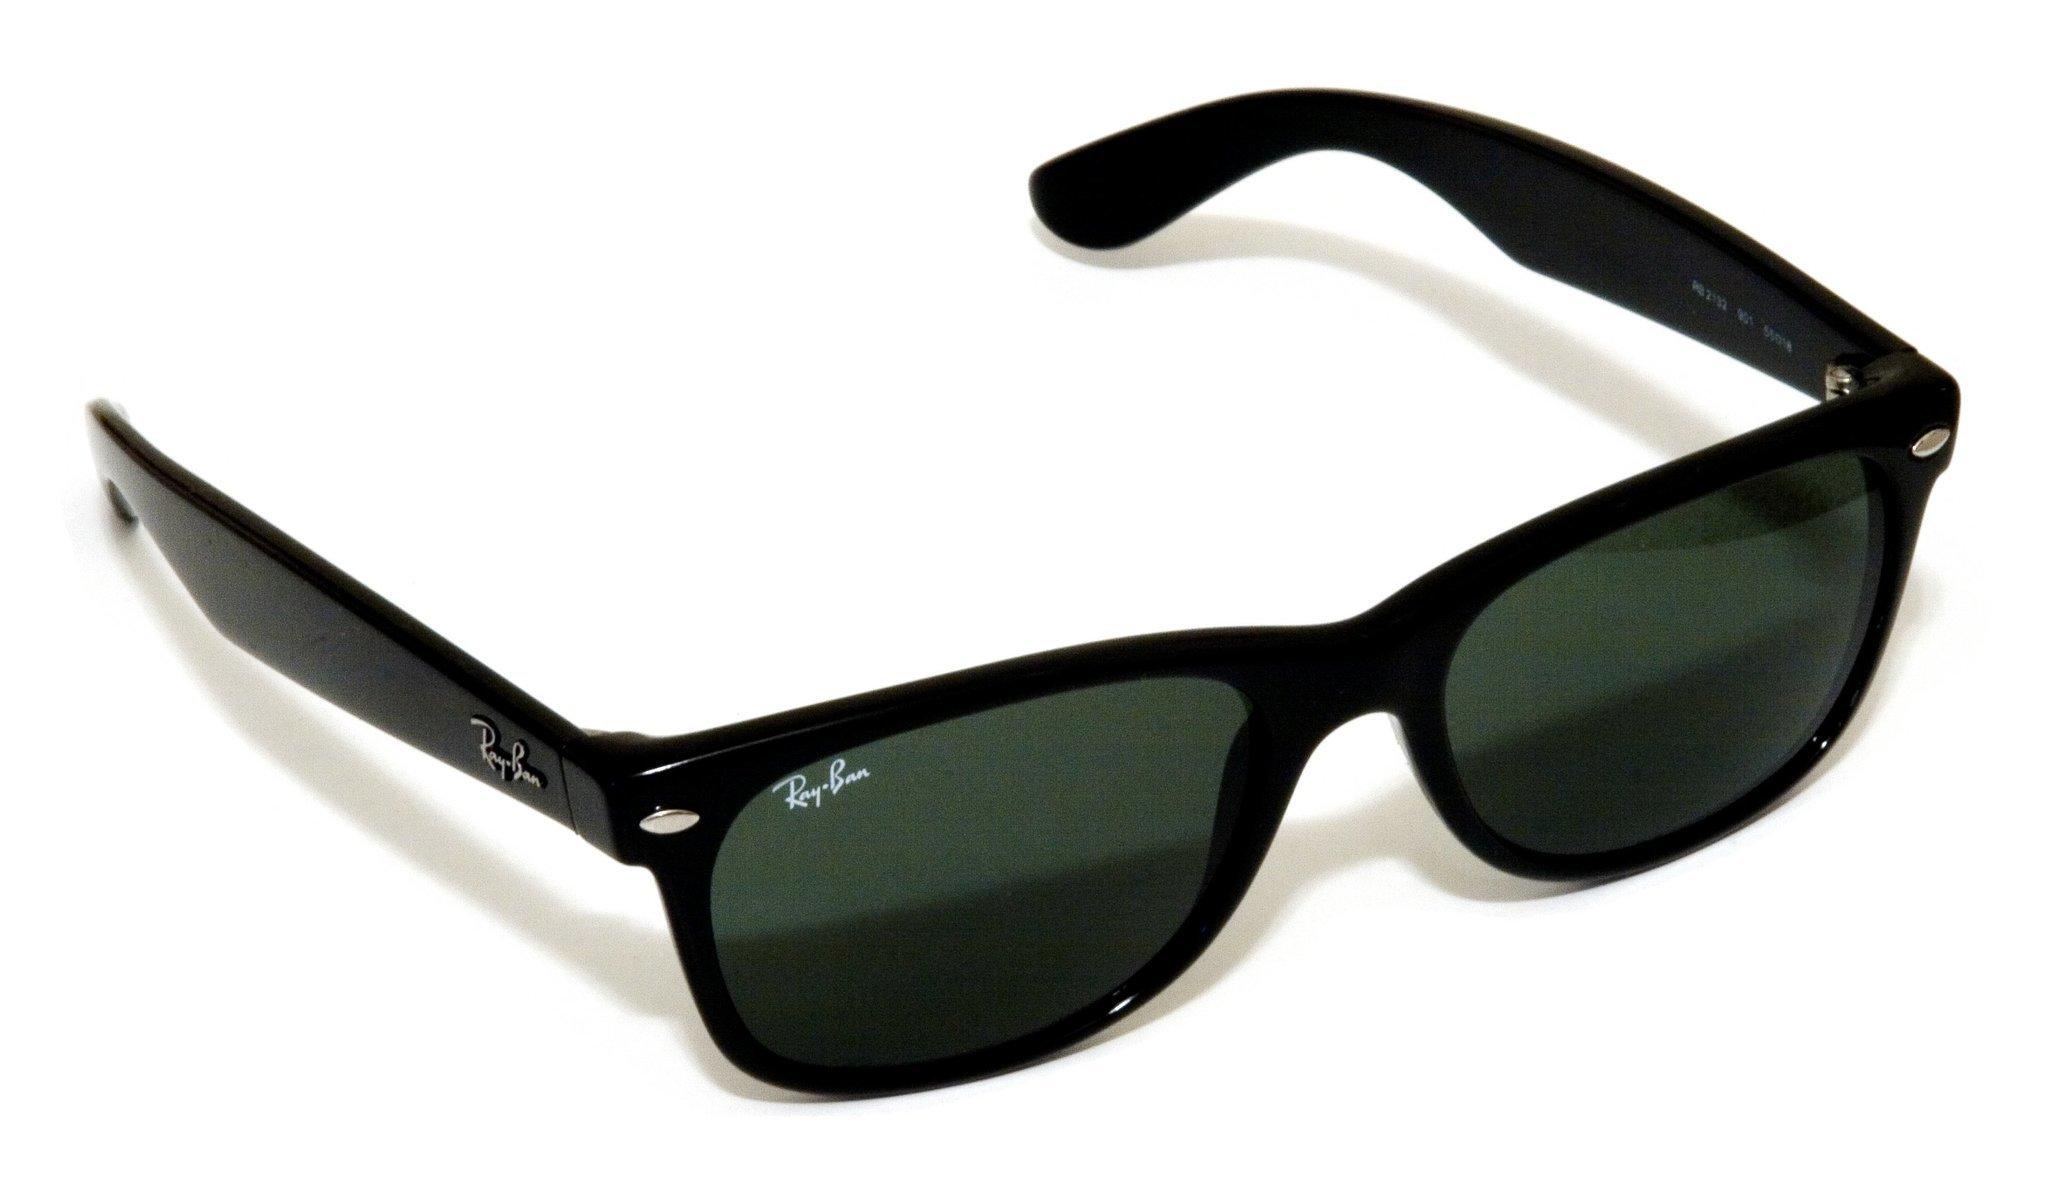 87ad7cfee Ray Ban Luxottica Sunglasses « One More Soul